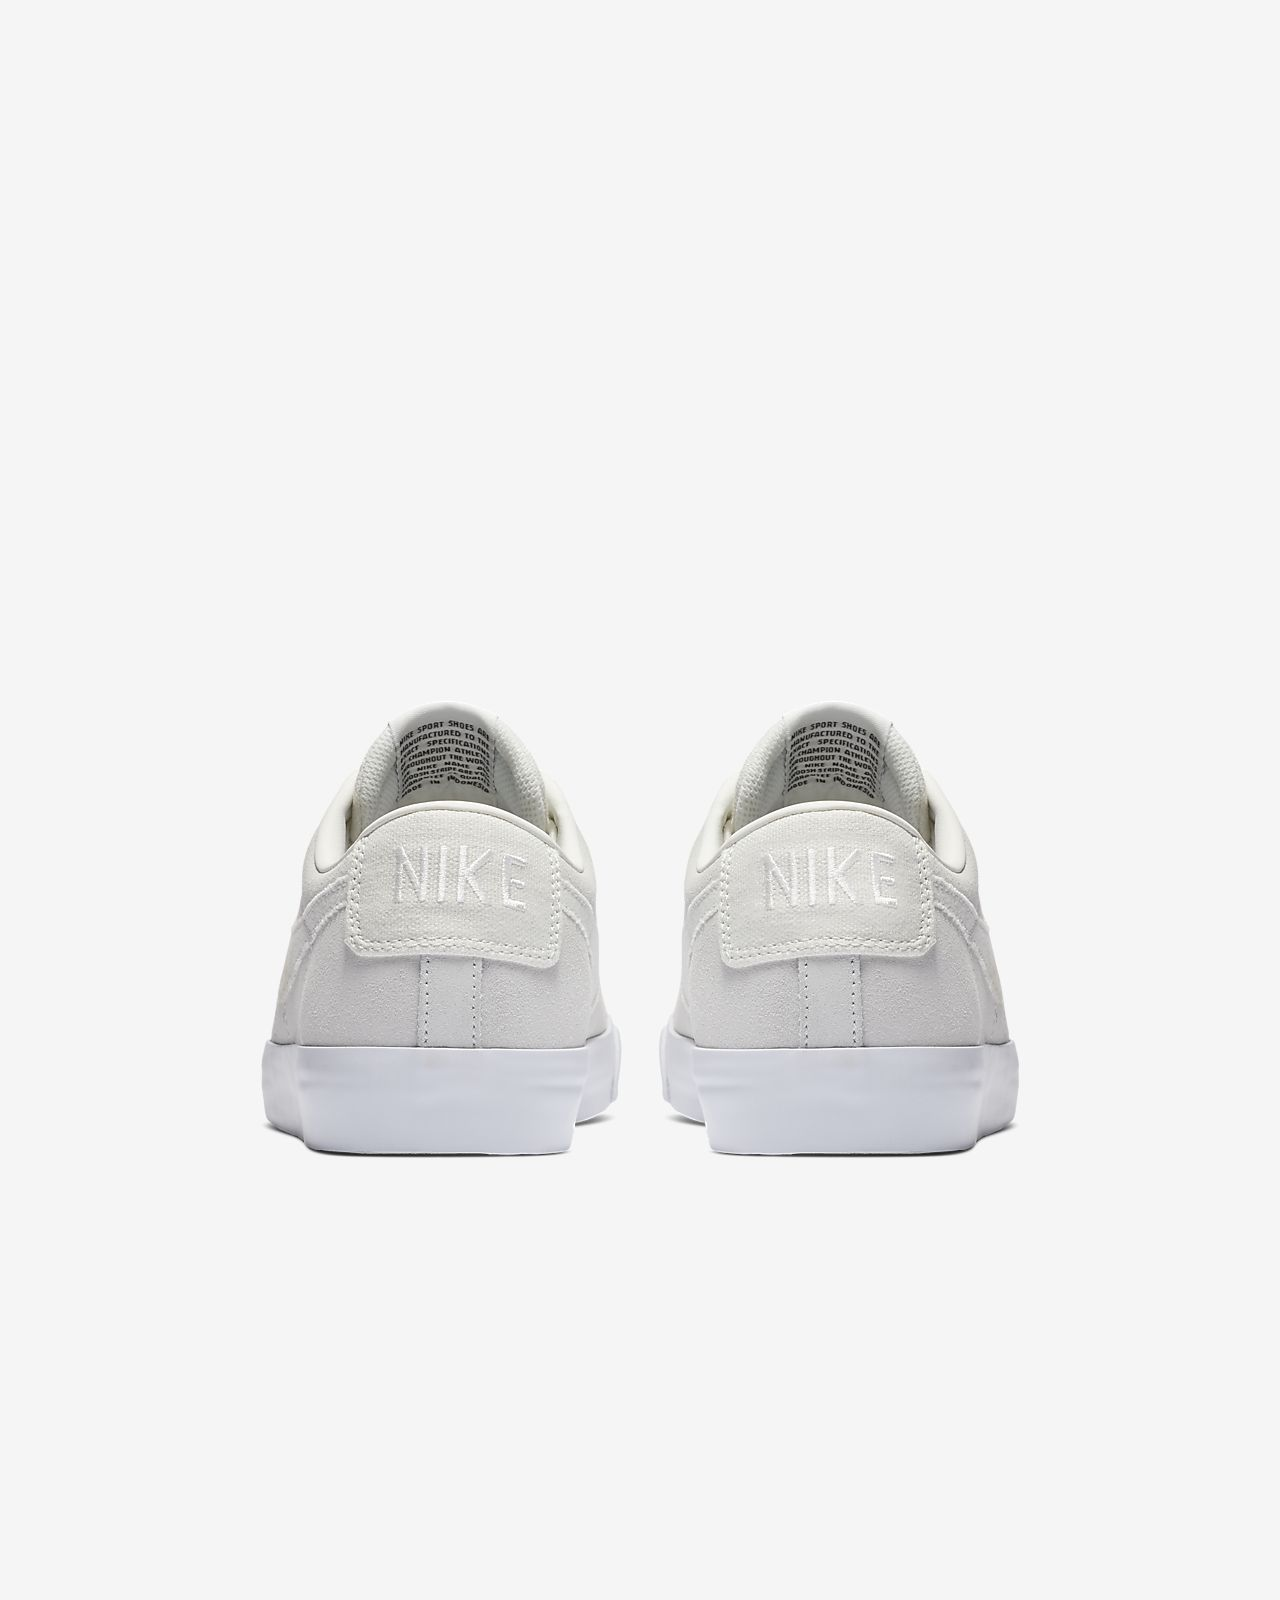 5131dc7216a7 Nike SB Blazer Low GT Skate Shoe. Nike.com